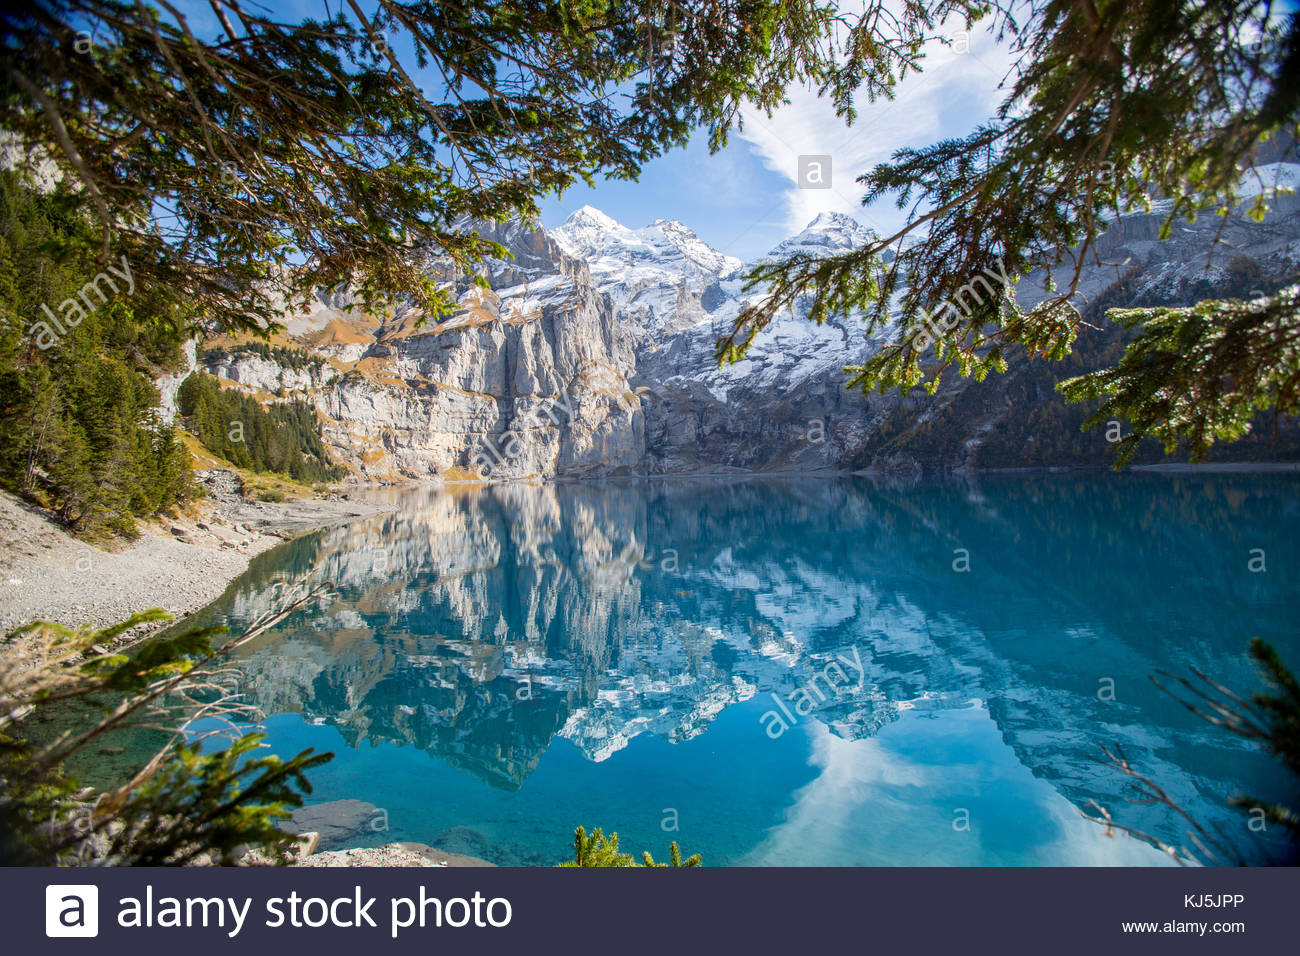 Lake Oeschinen - Stock Image